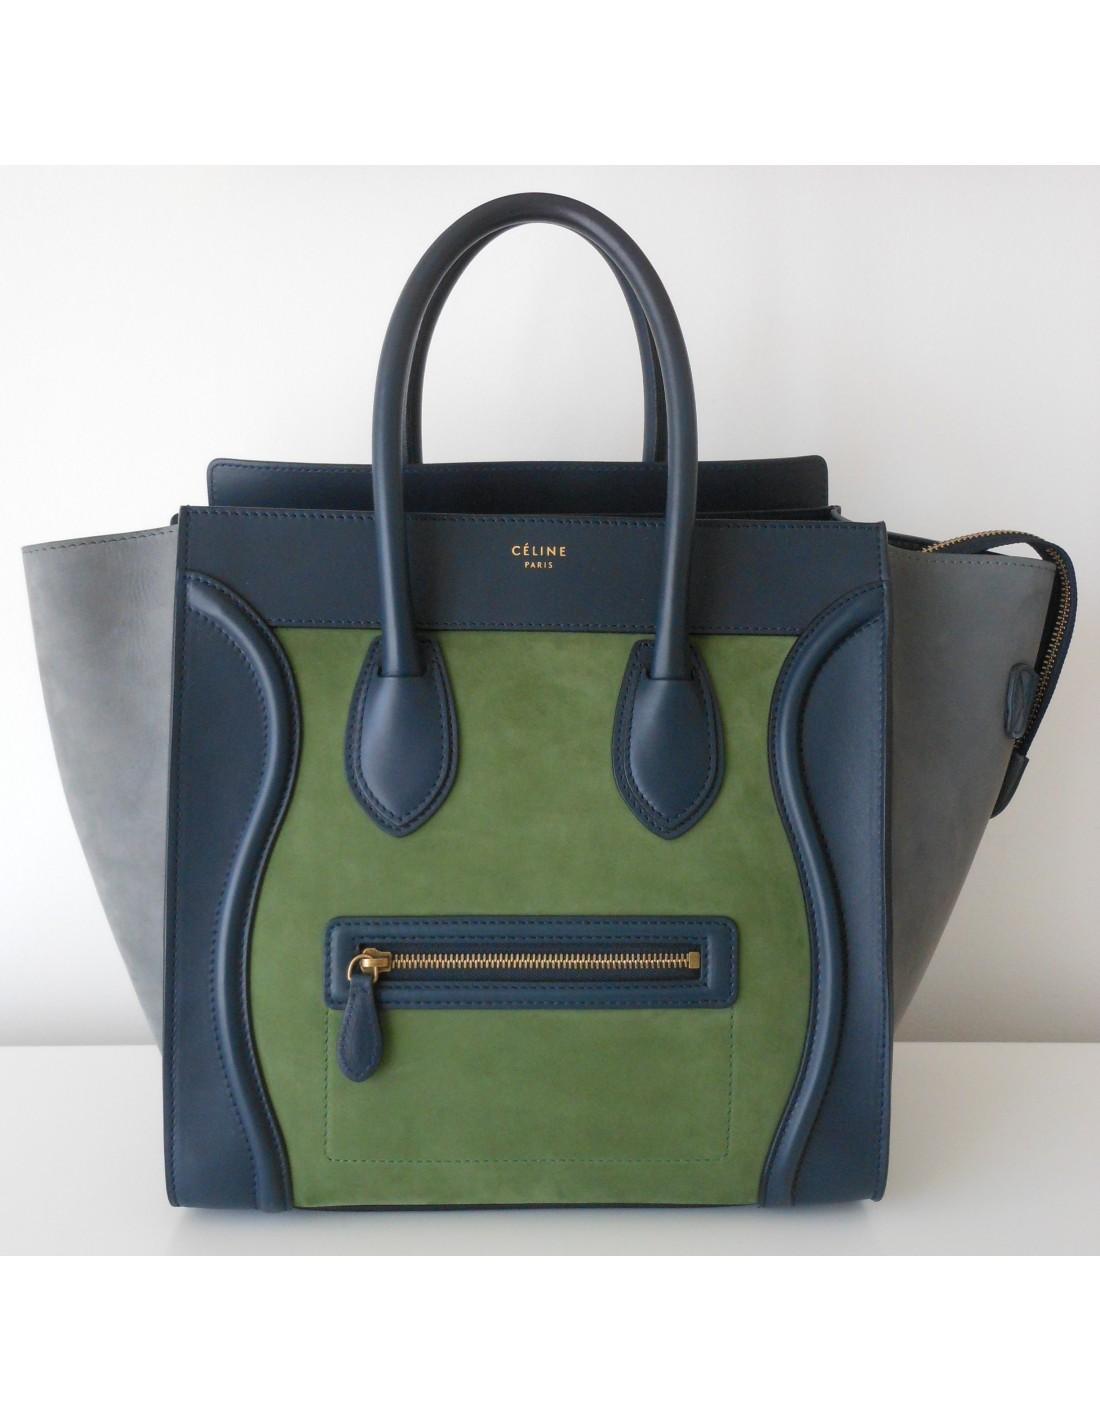 Atoutluxe Celine Luggage Boutique Micro Borsa cqpy71Hq